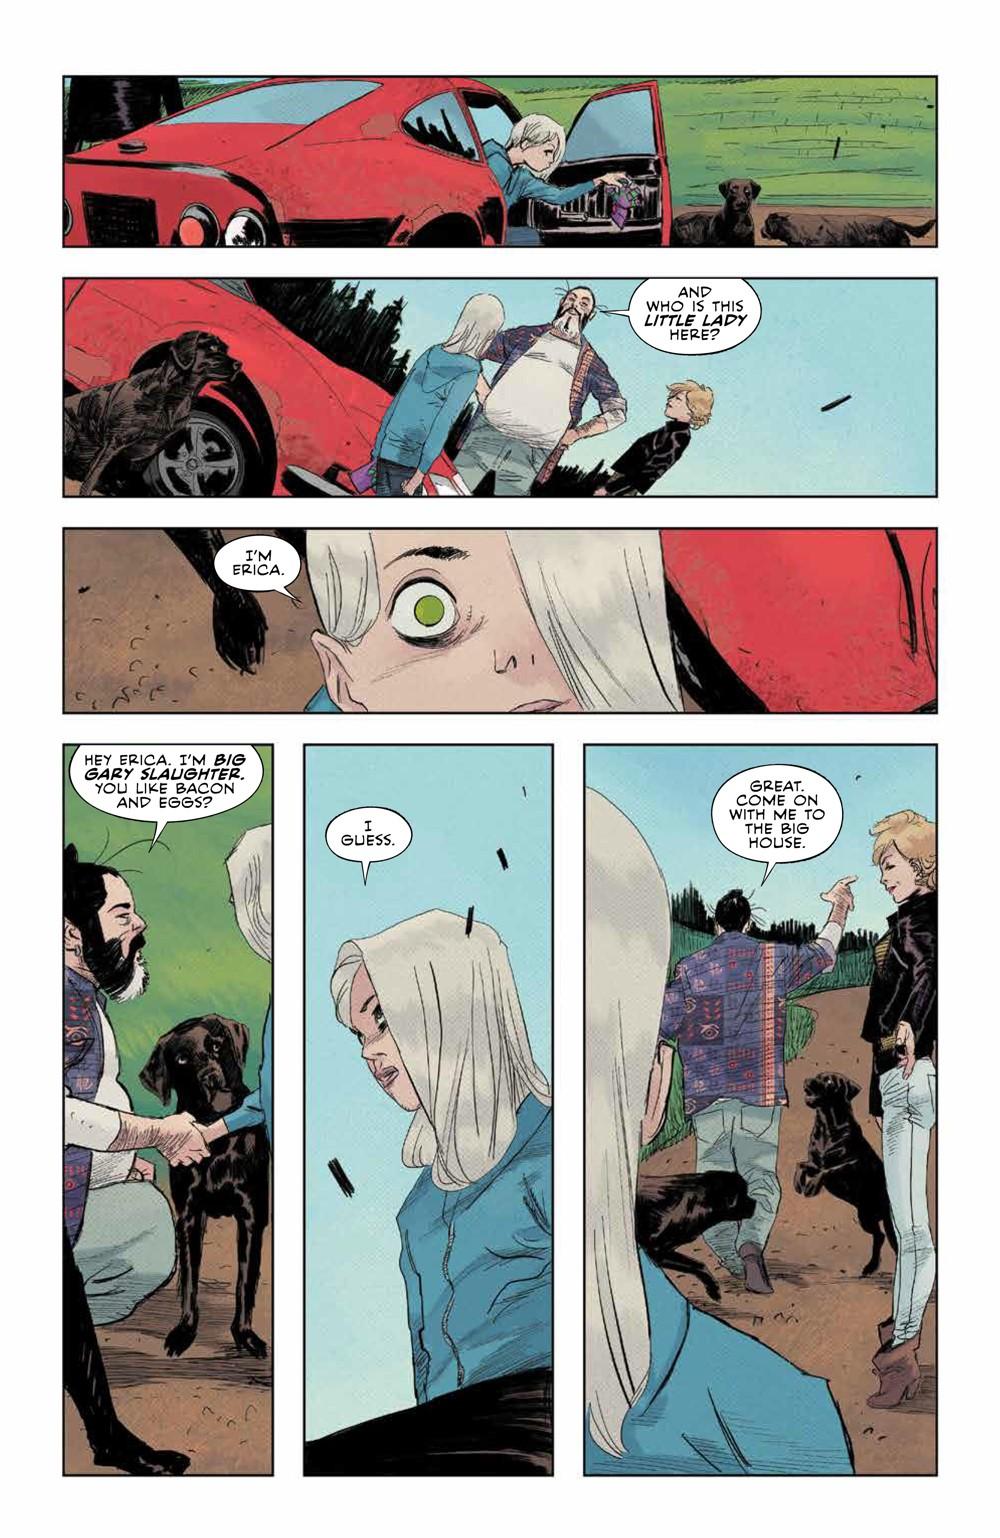 SomethingKillingChildren_018_PRESS_11 ComicList Previews: SOMETHING IS KILLING THE CHILDREN #18